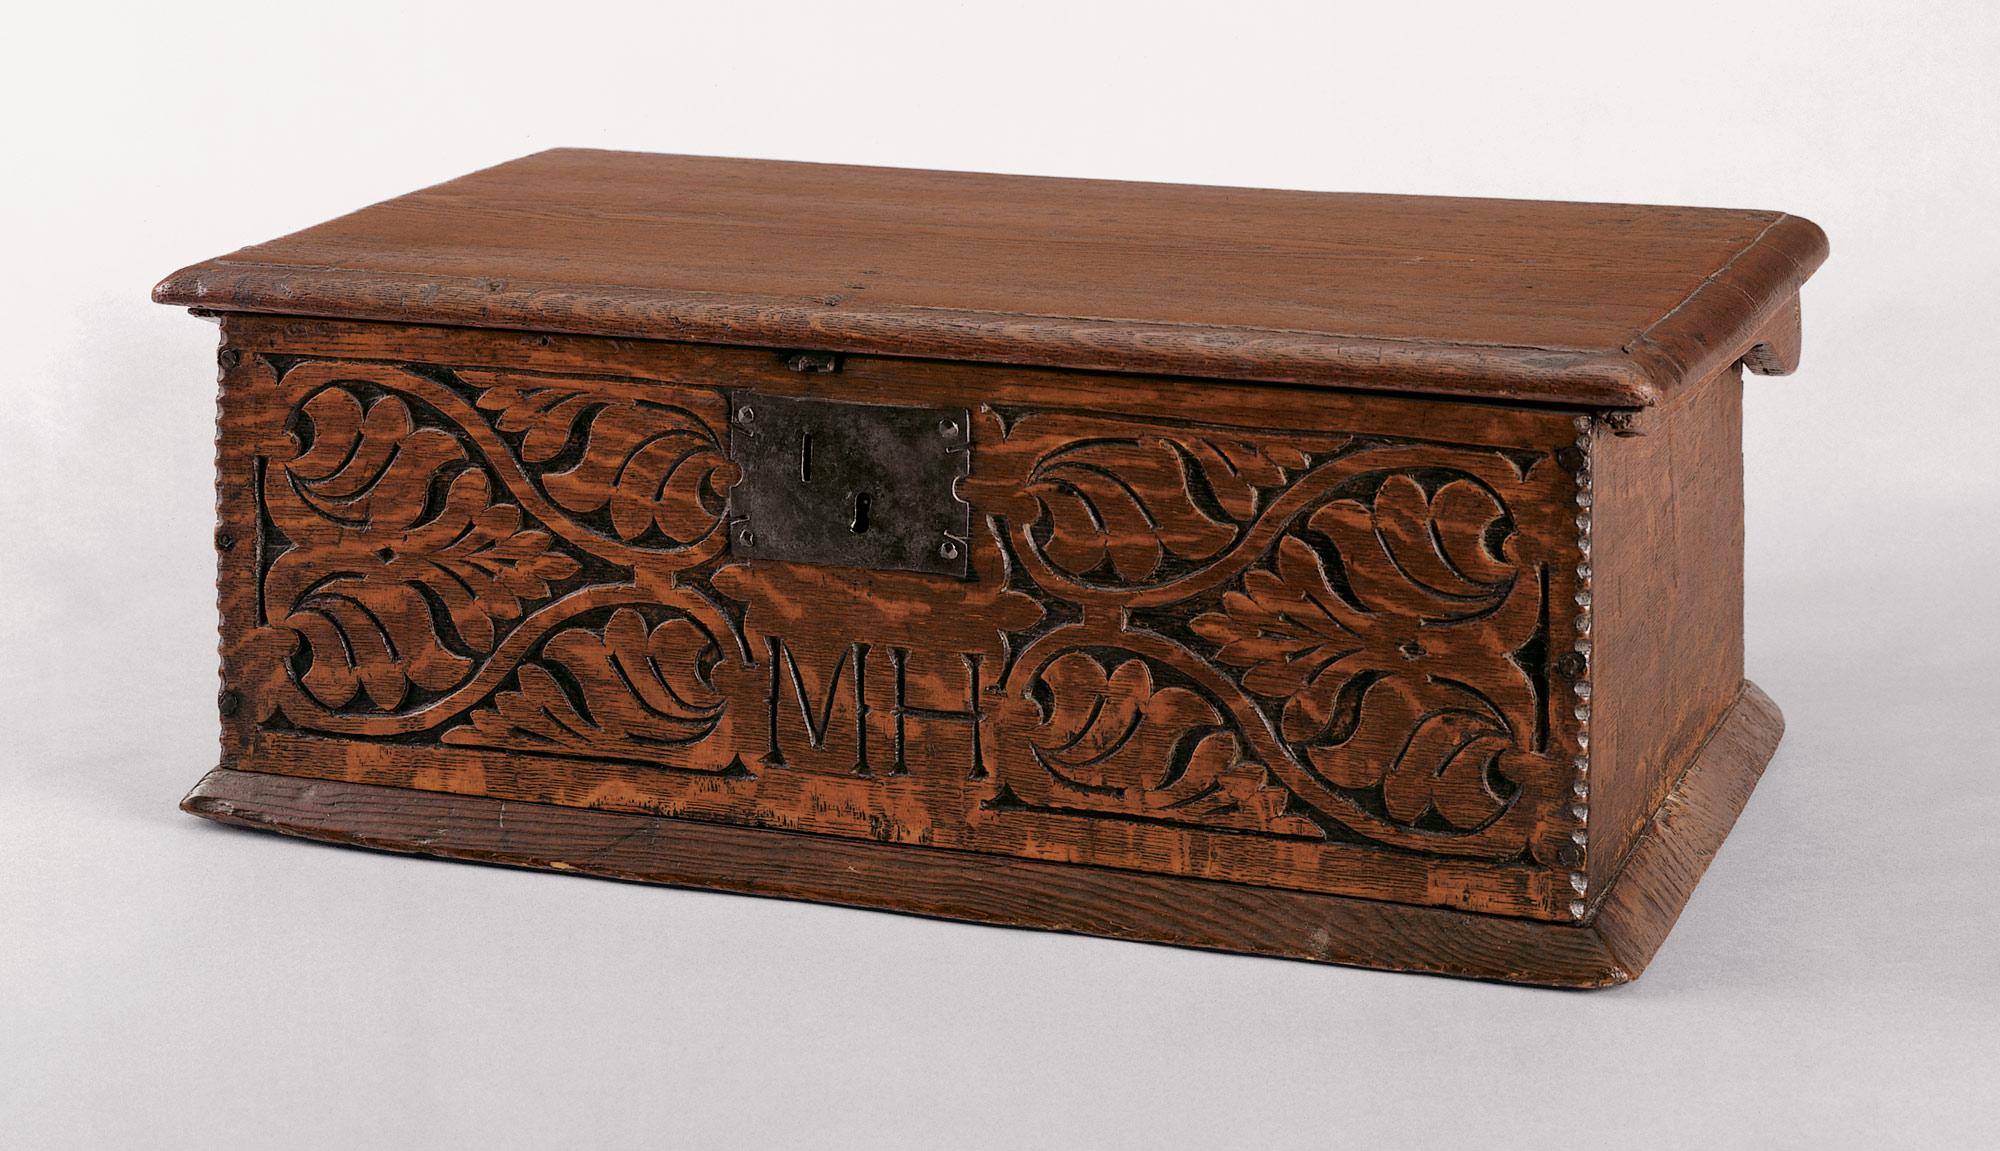 william and mary chair kijaro dual lock folding xxl american furniture 16201730 the seventeenth century